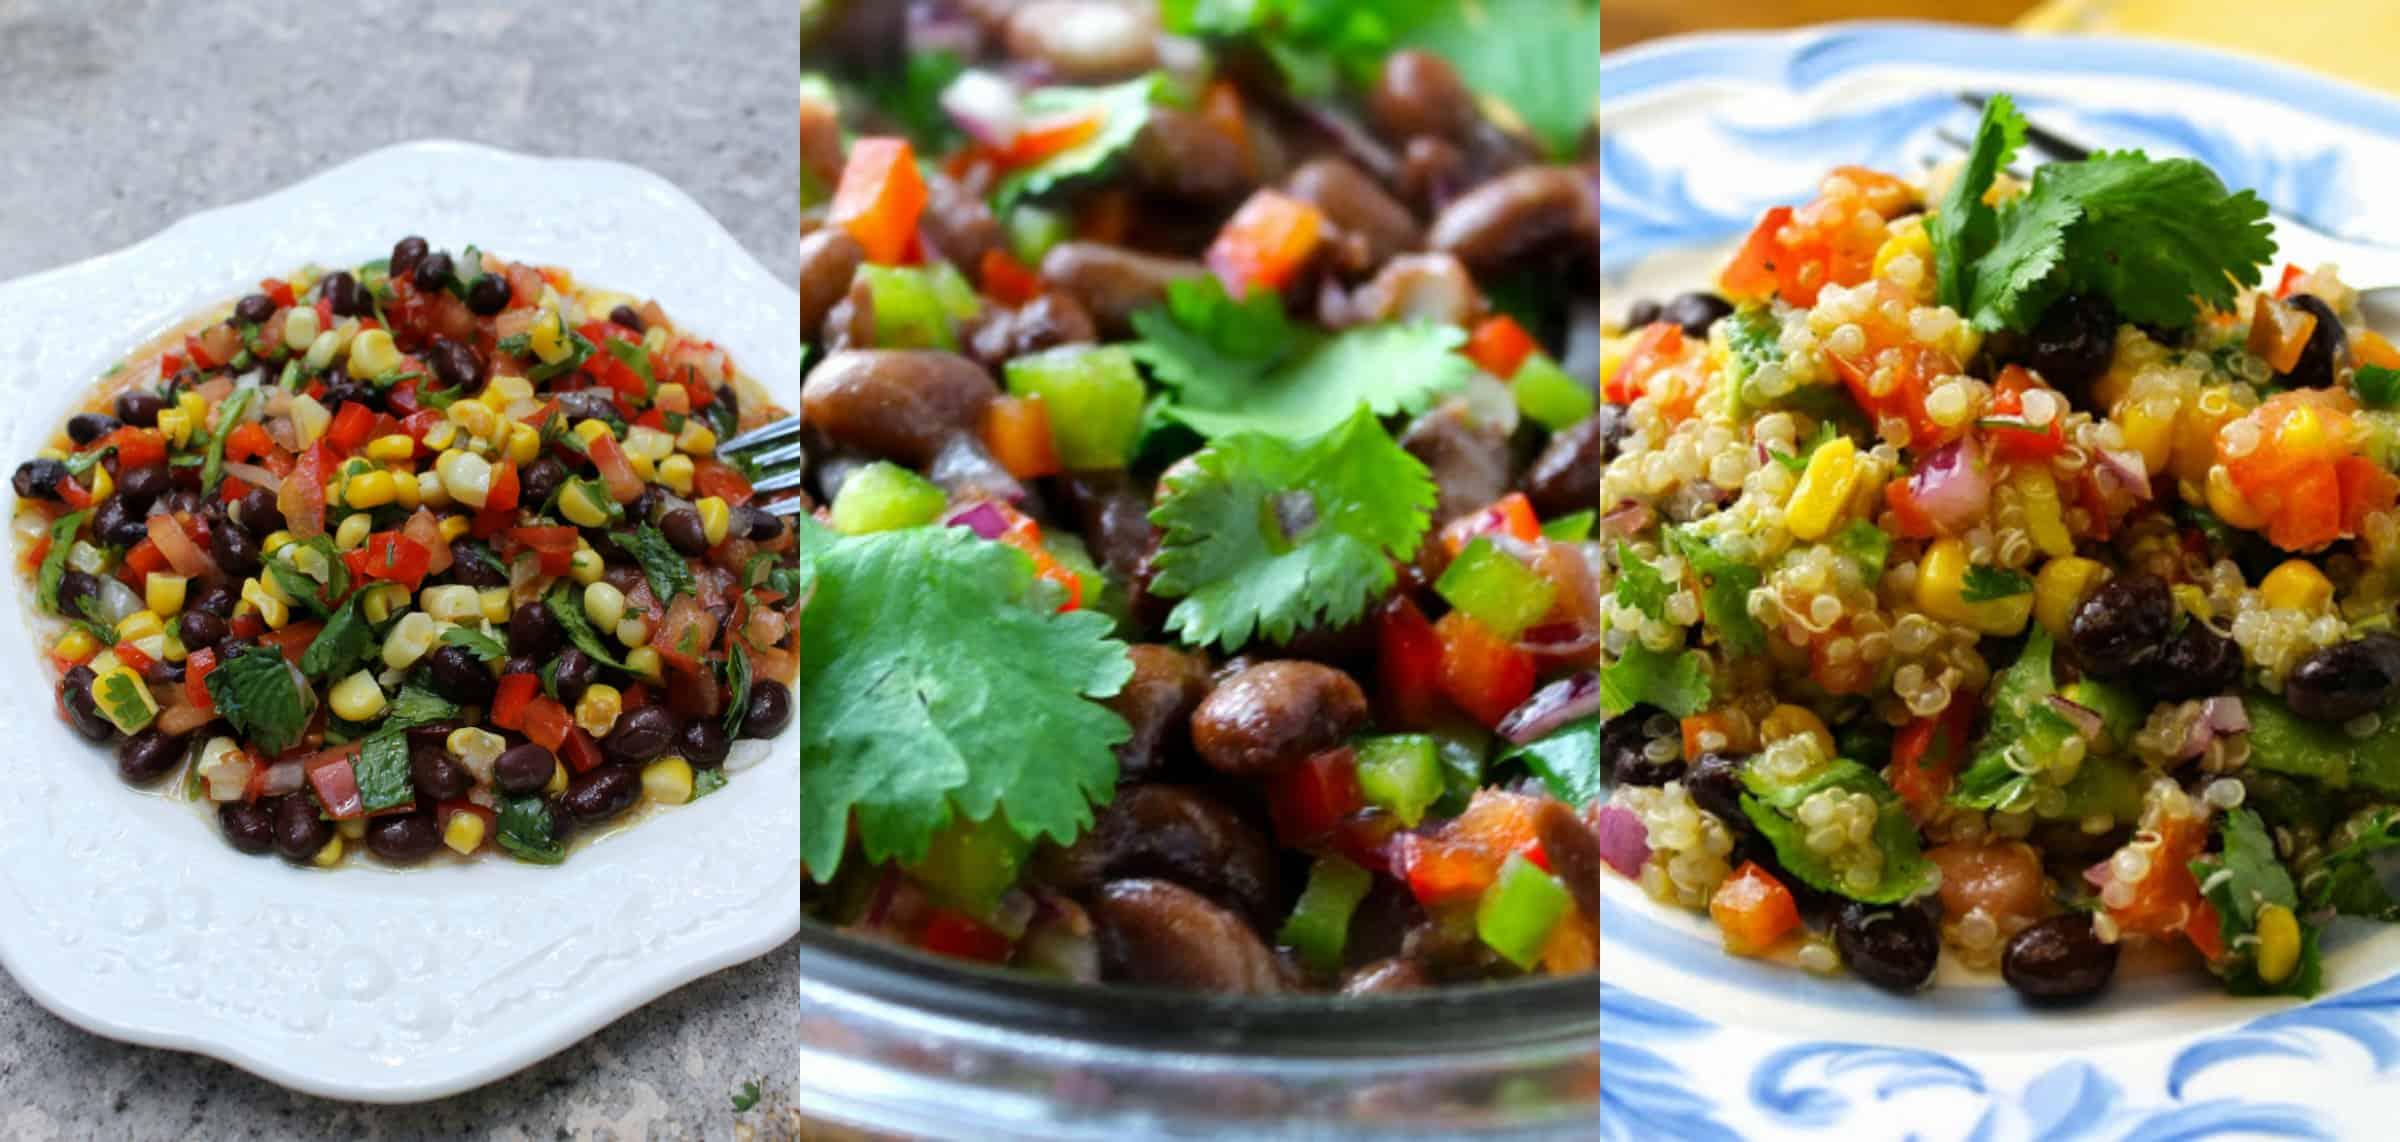 Recetas 3 ensaladas que se preparan en 10 minutos for Cocinar en 10 minutos